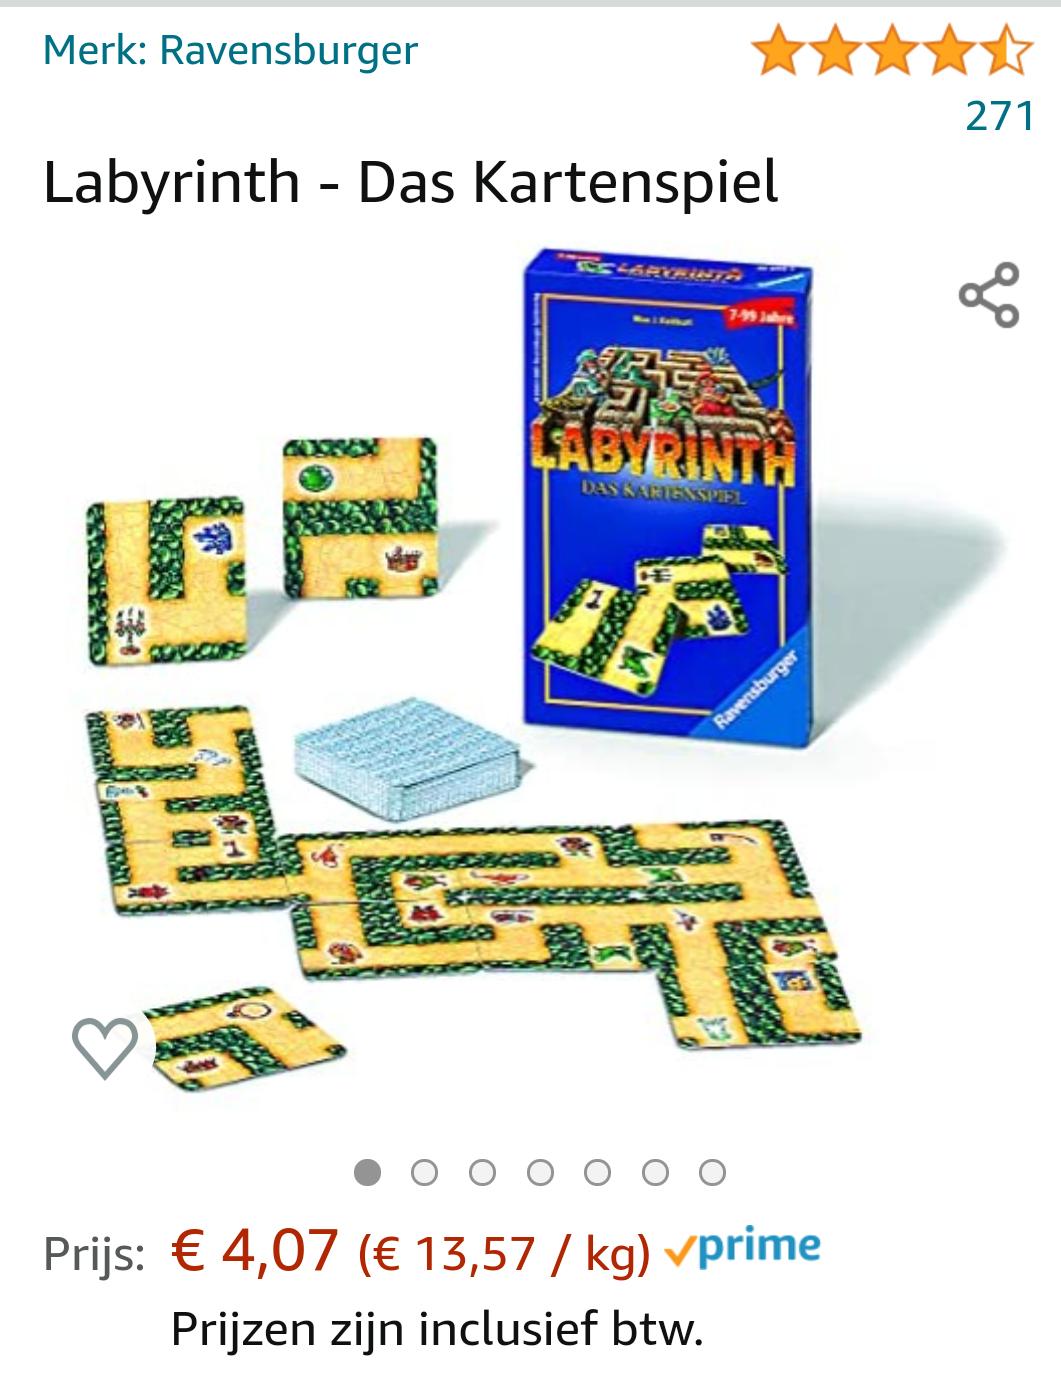 Labyrinth Het kaartenspel